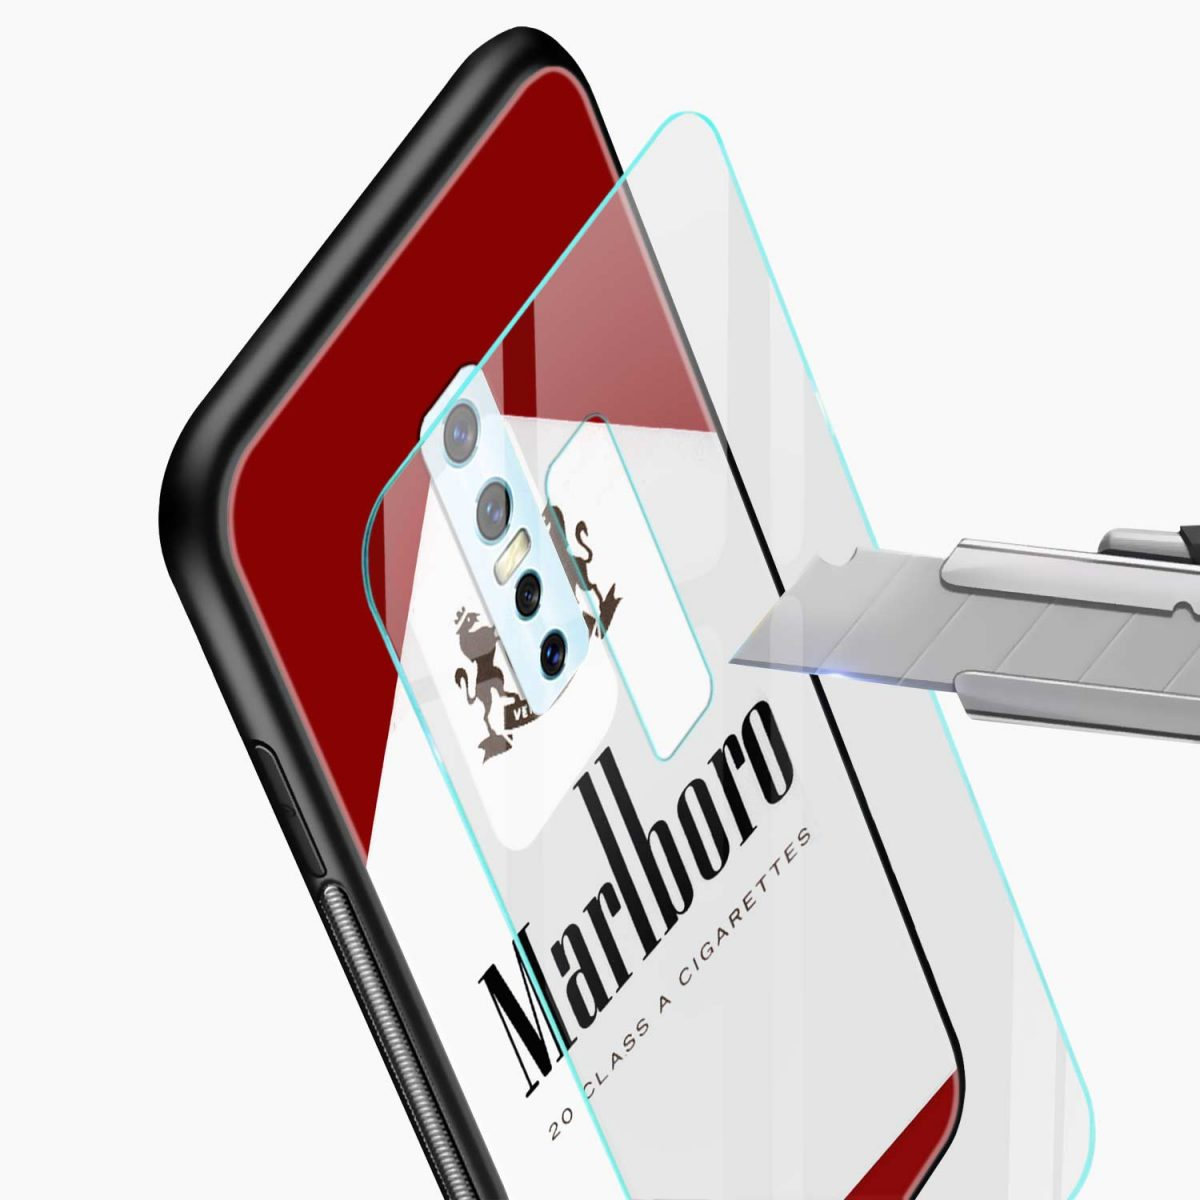 marlbor ciarette box glass view vivo v17 plug back cover